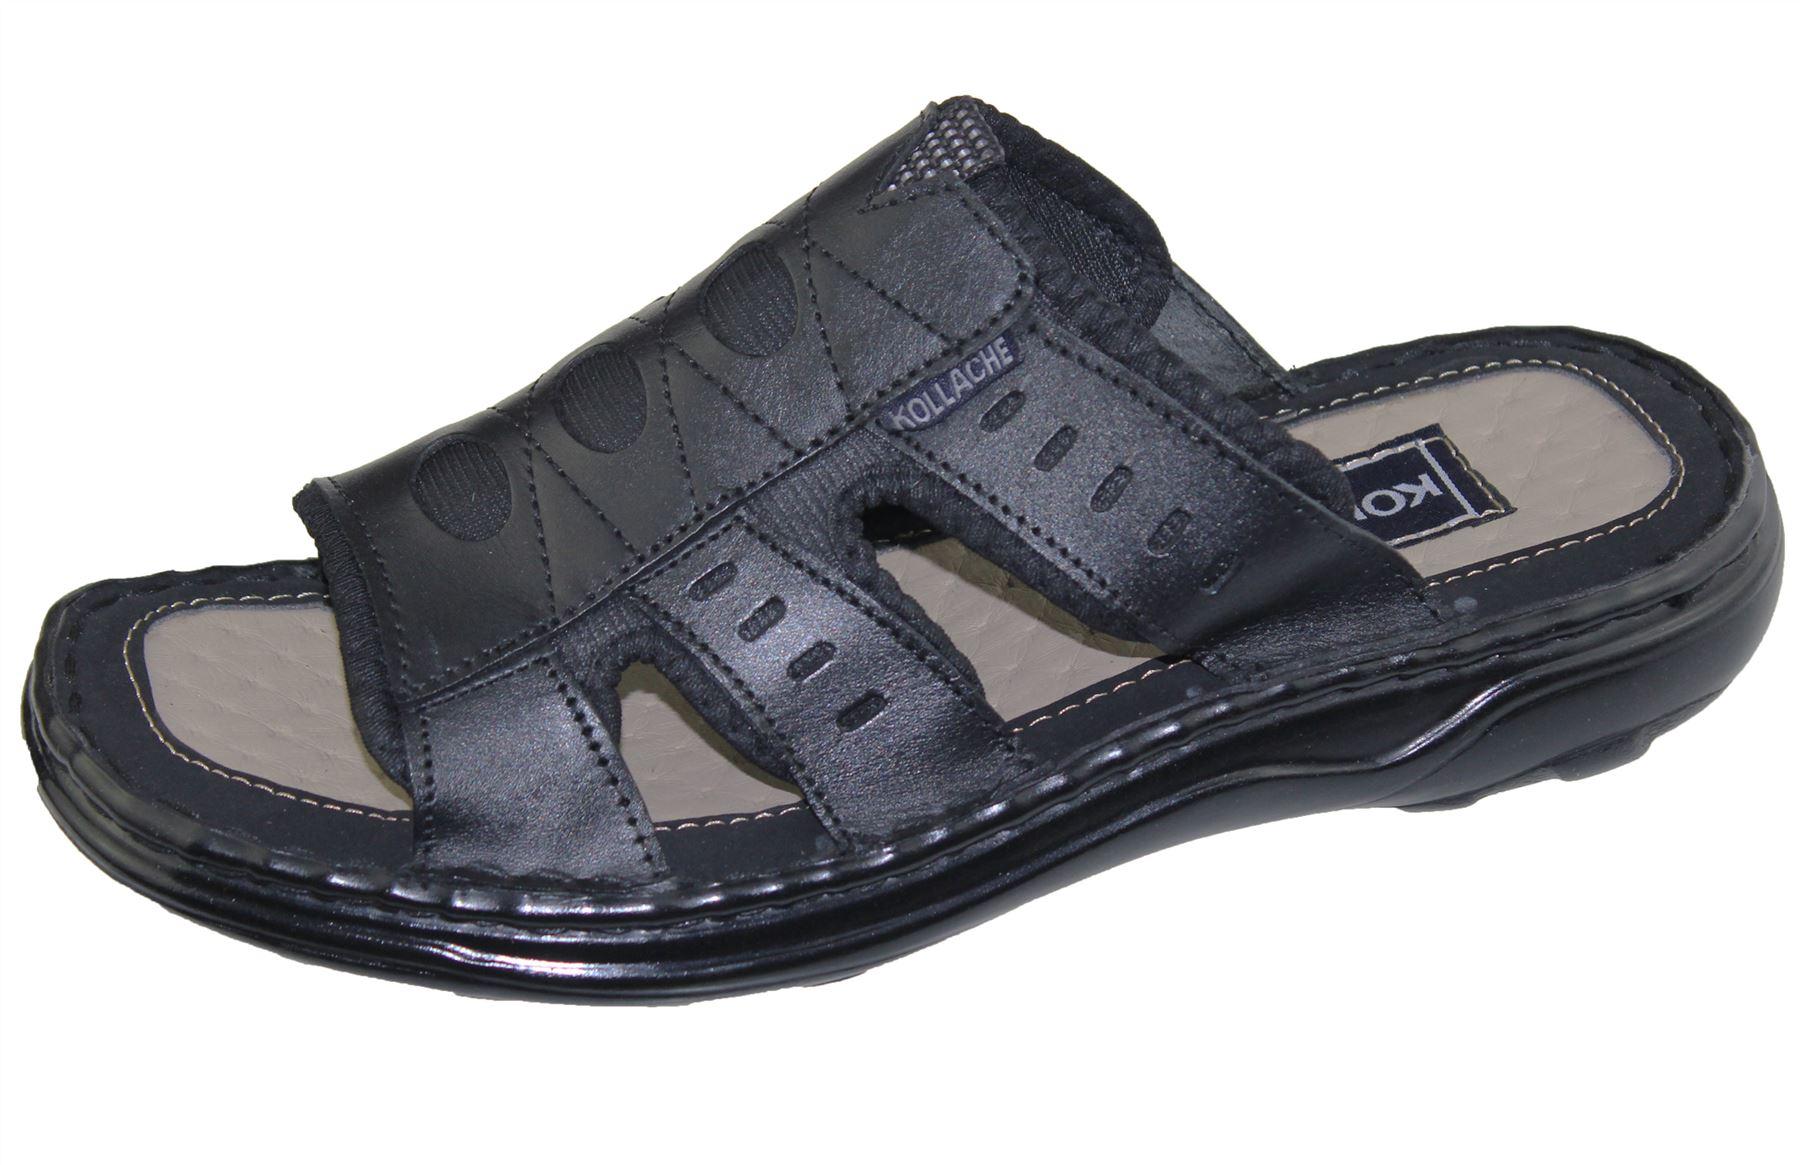 Mens-Slipper-Sandal-Sports-Beach-Buckle-Walking-Fashion-Summer-Casual-Shoes-Size miniatura 15